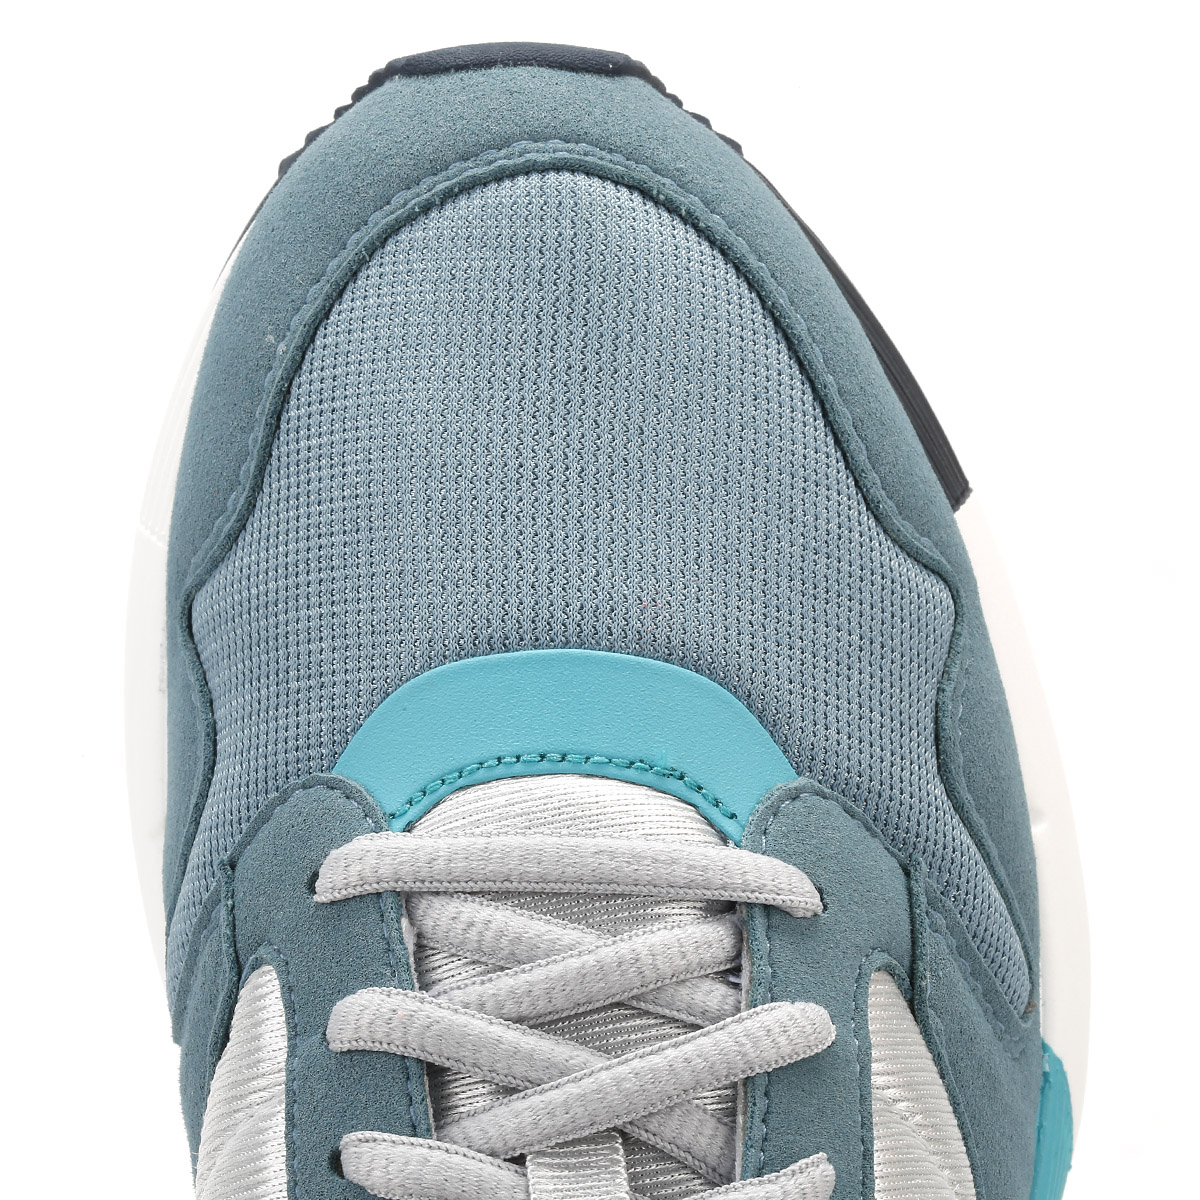 9a43f6c19744 Le Coq Sportif Womens Trainers Galet   Smoke Blue Omega X W Ladies Sport  Shoes